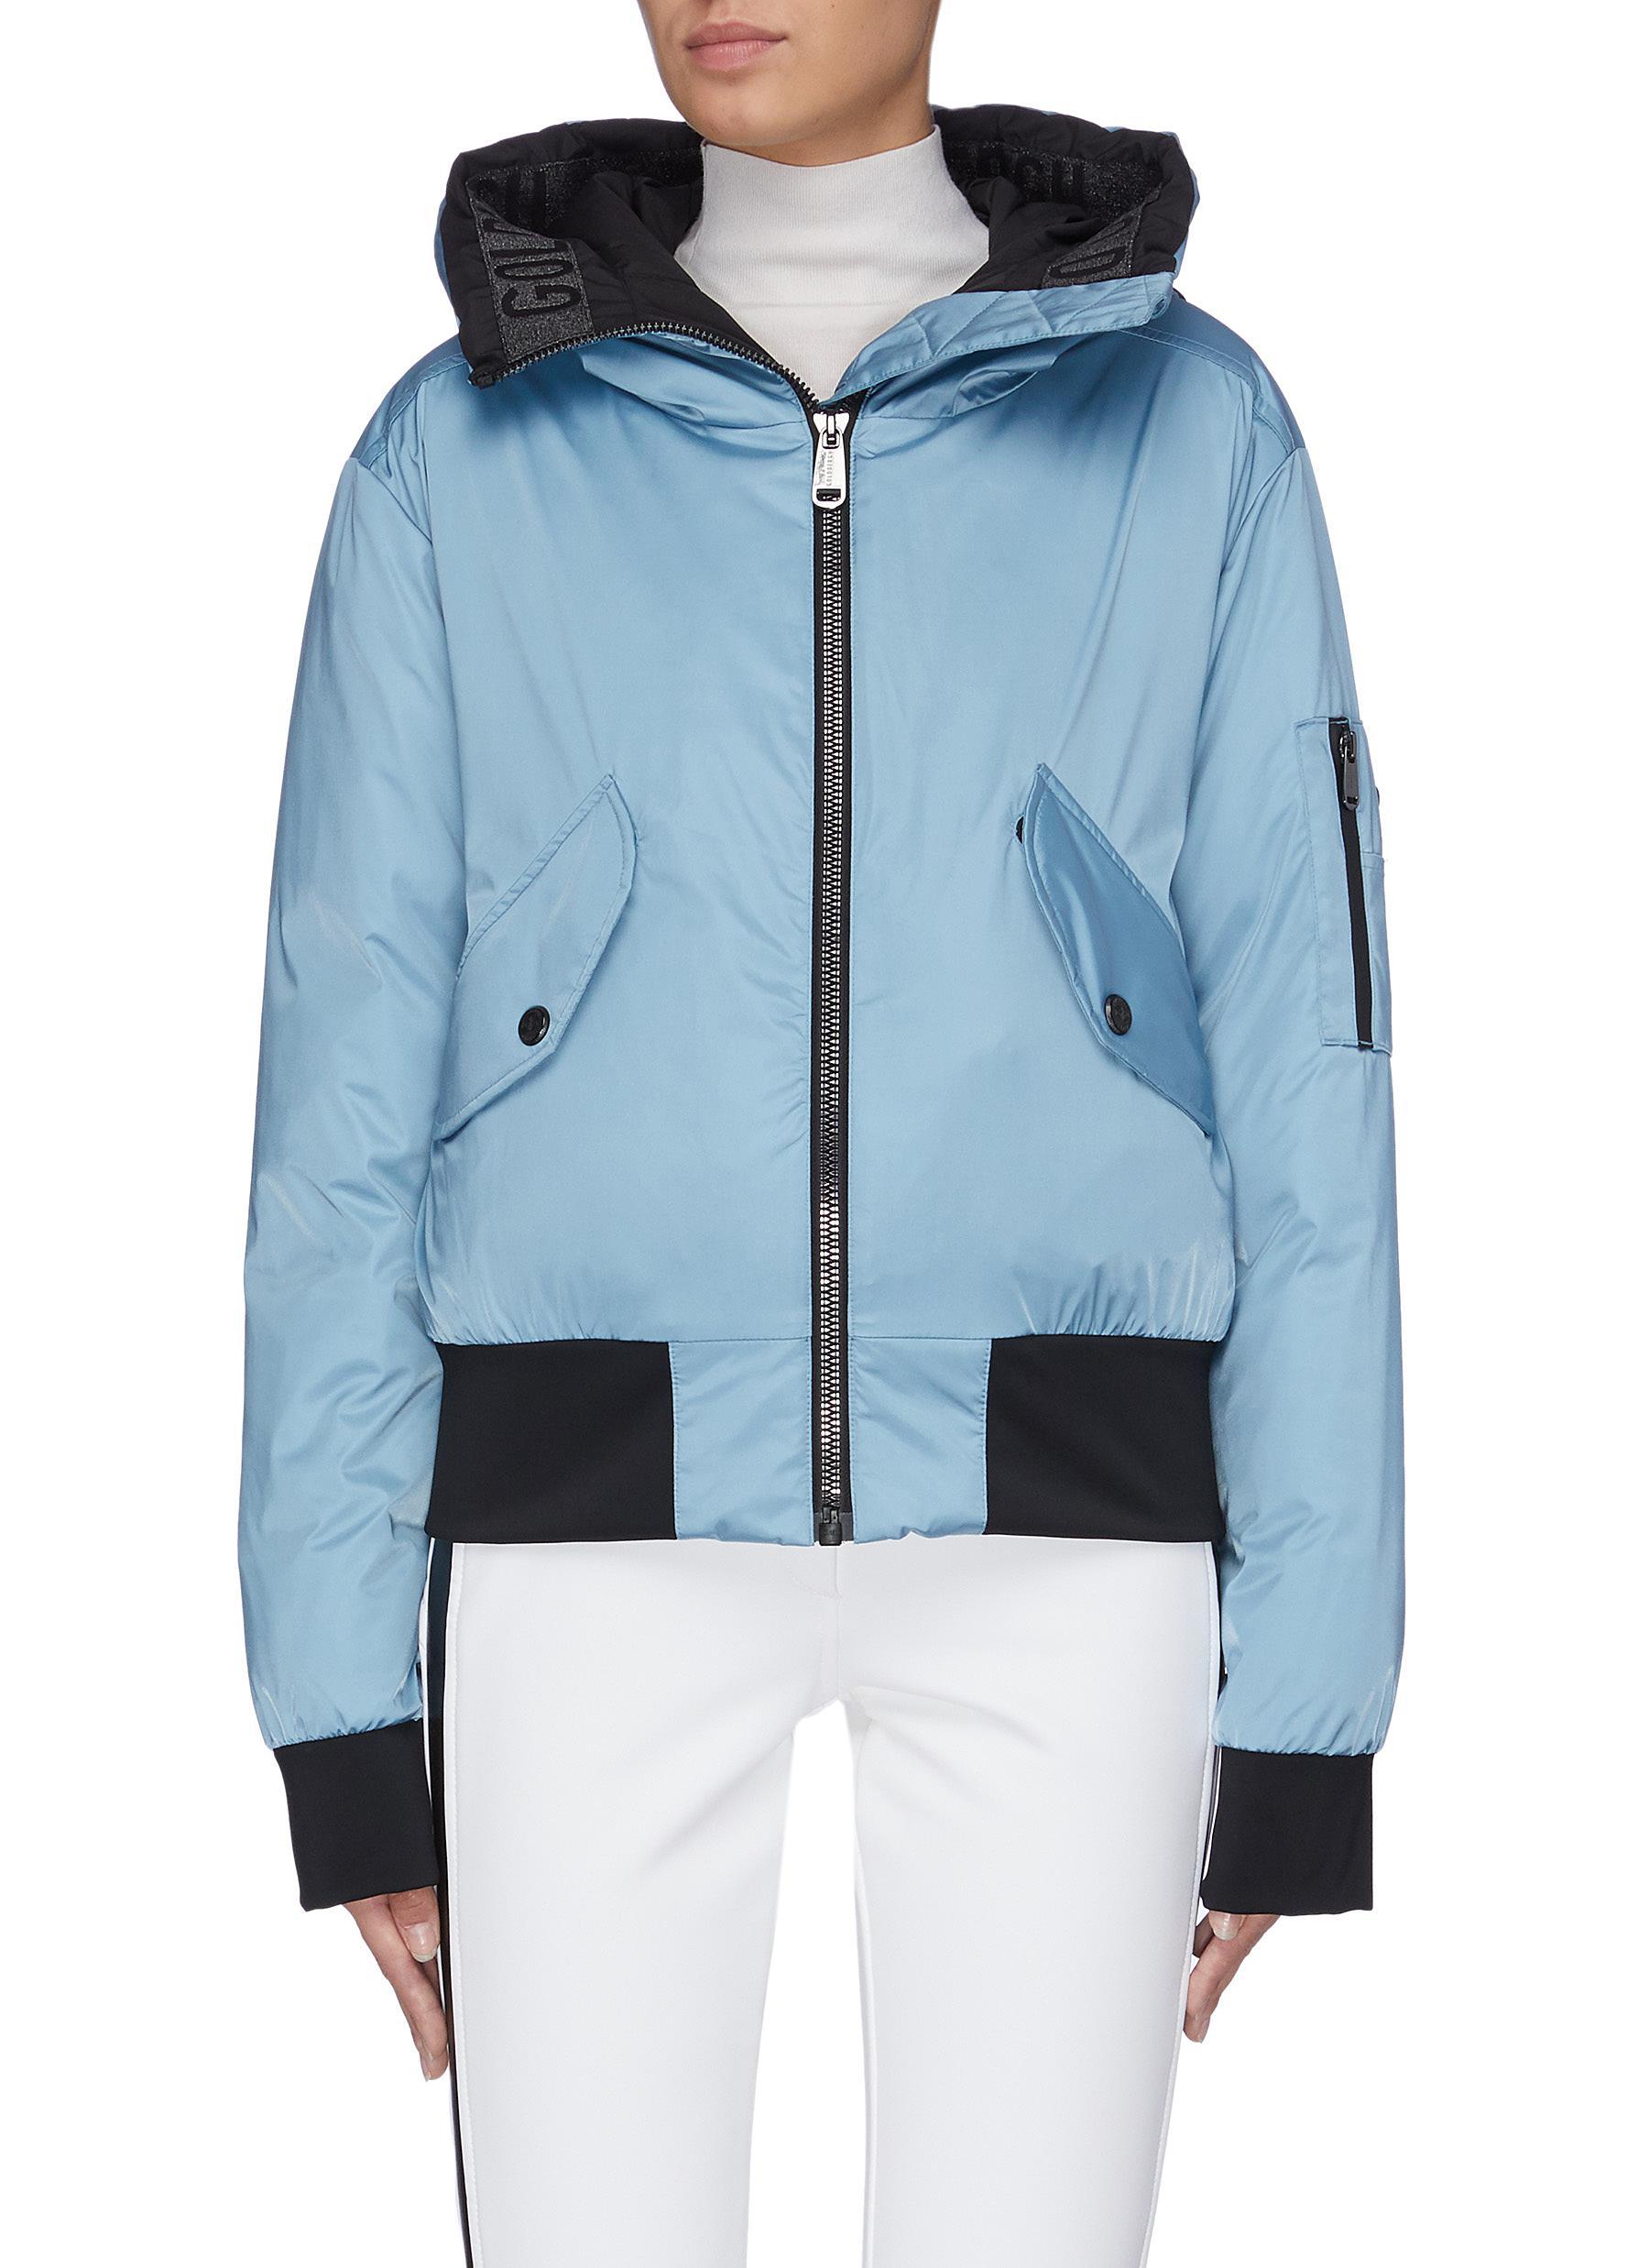 Buy Goldbergh Jackets 'Gilsa' hooded performance down jacket